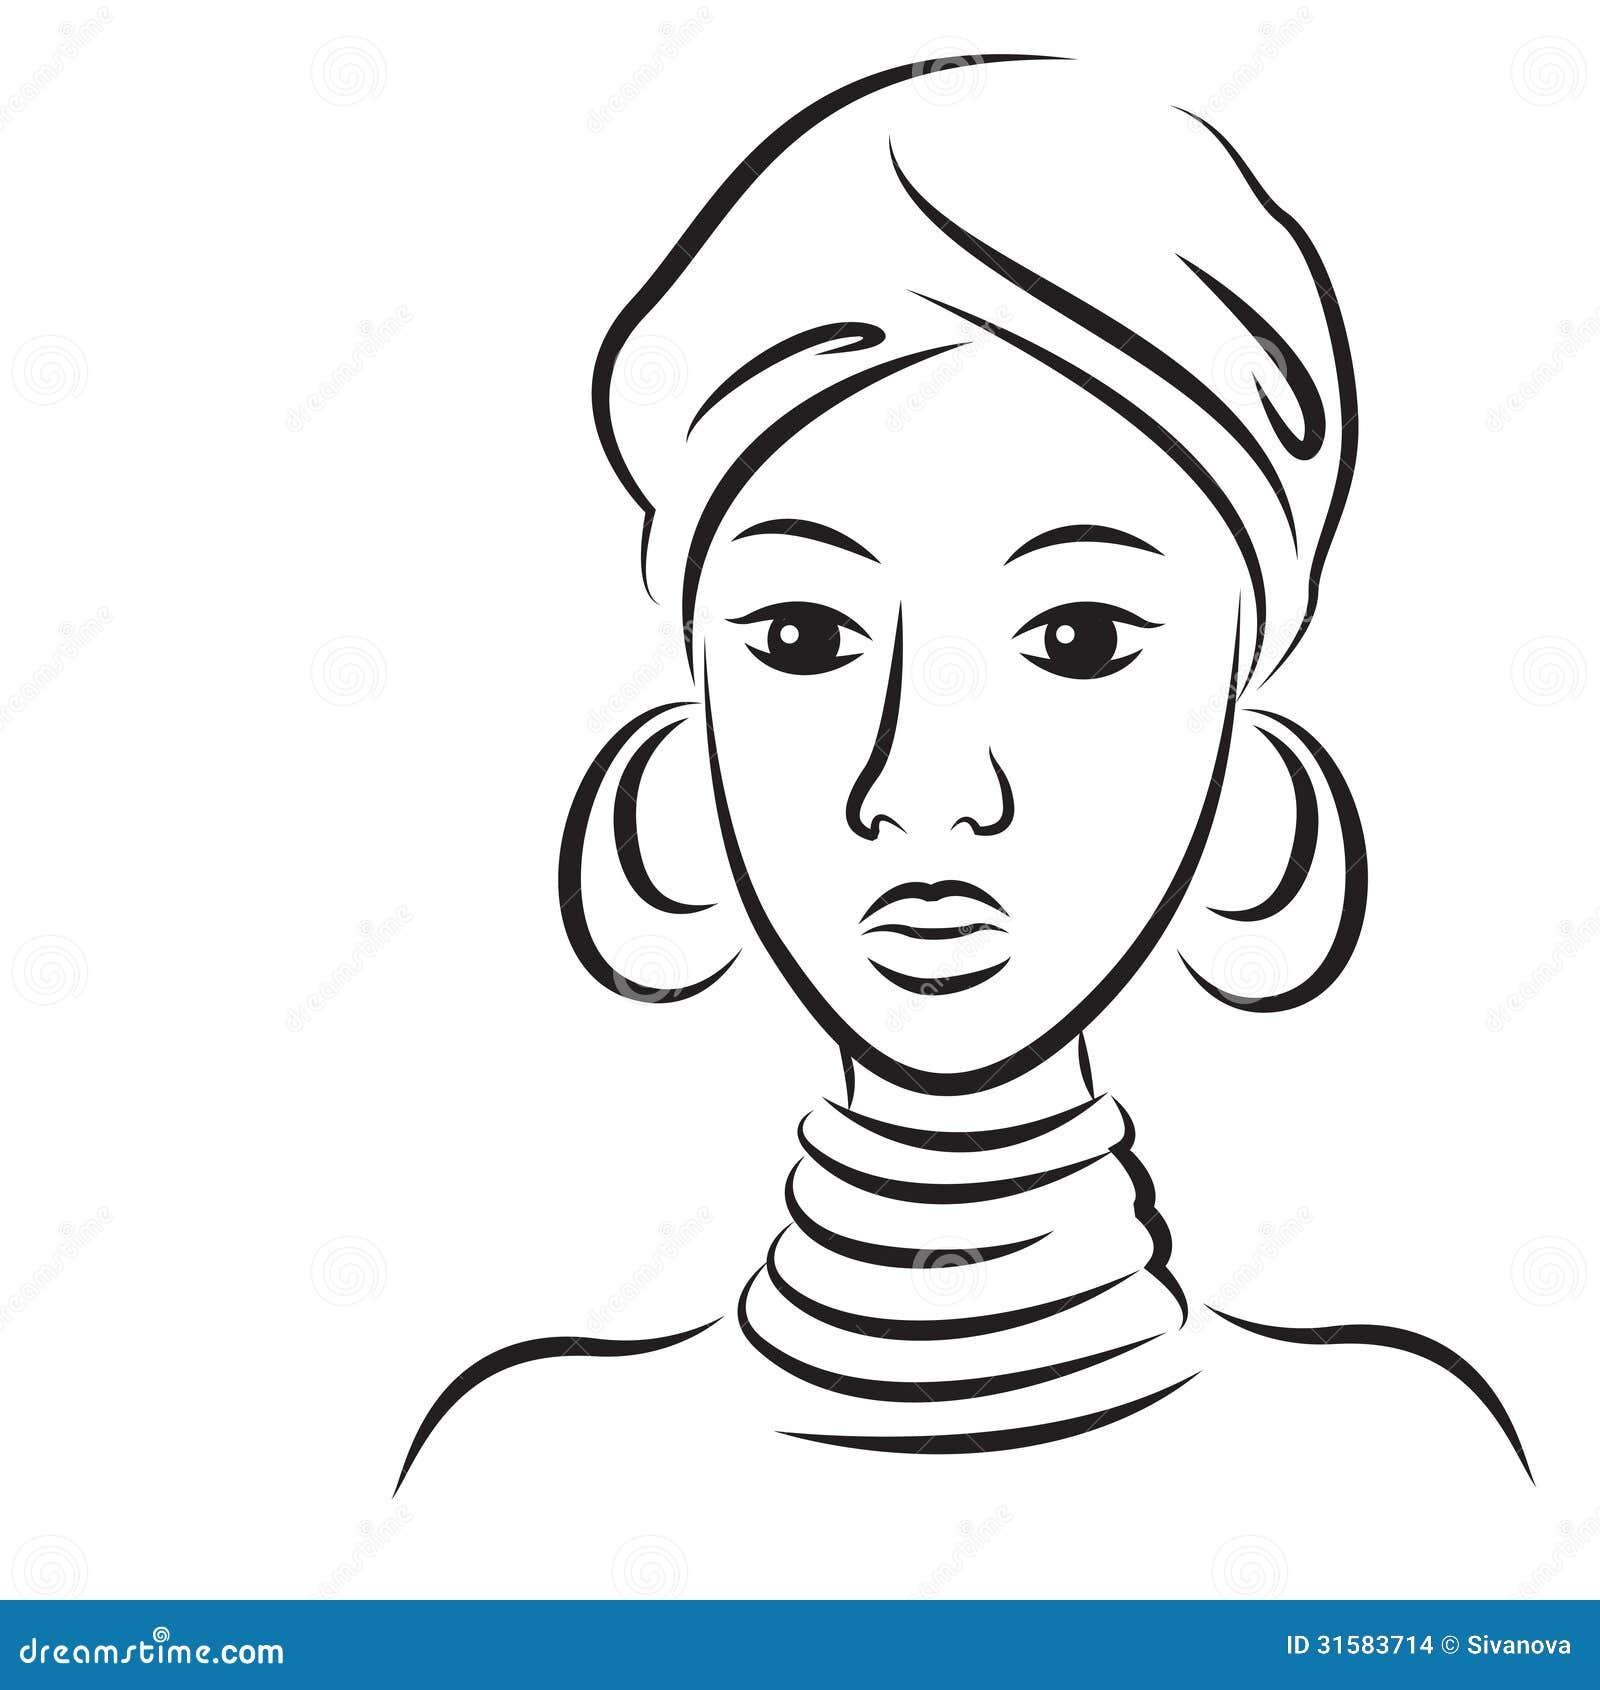 mulher-africana-bonita-nova-31583714.jpg